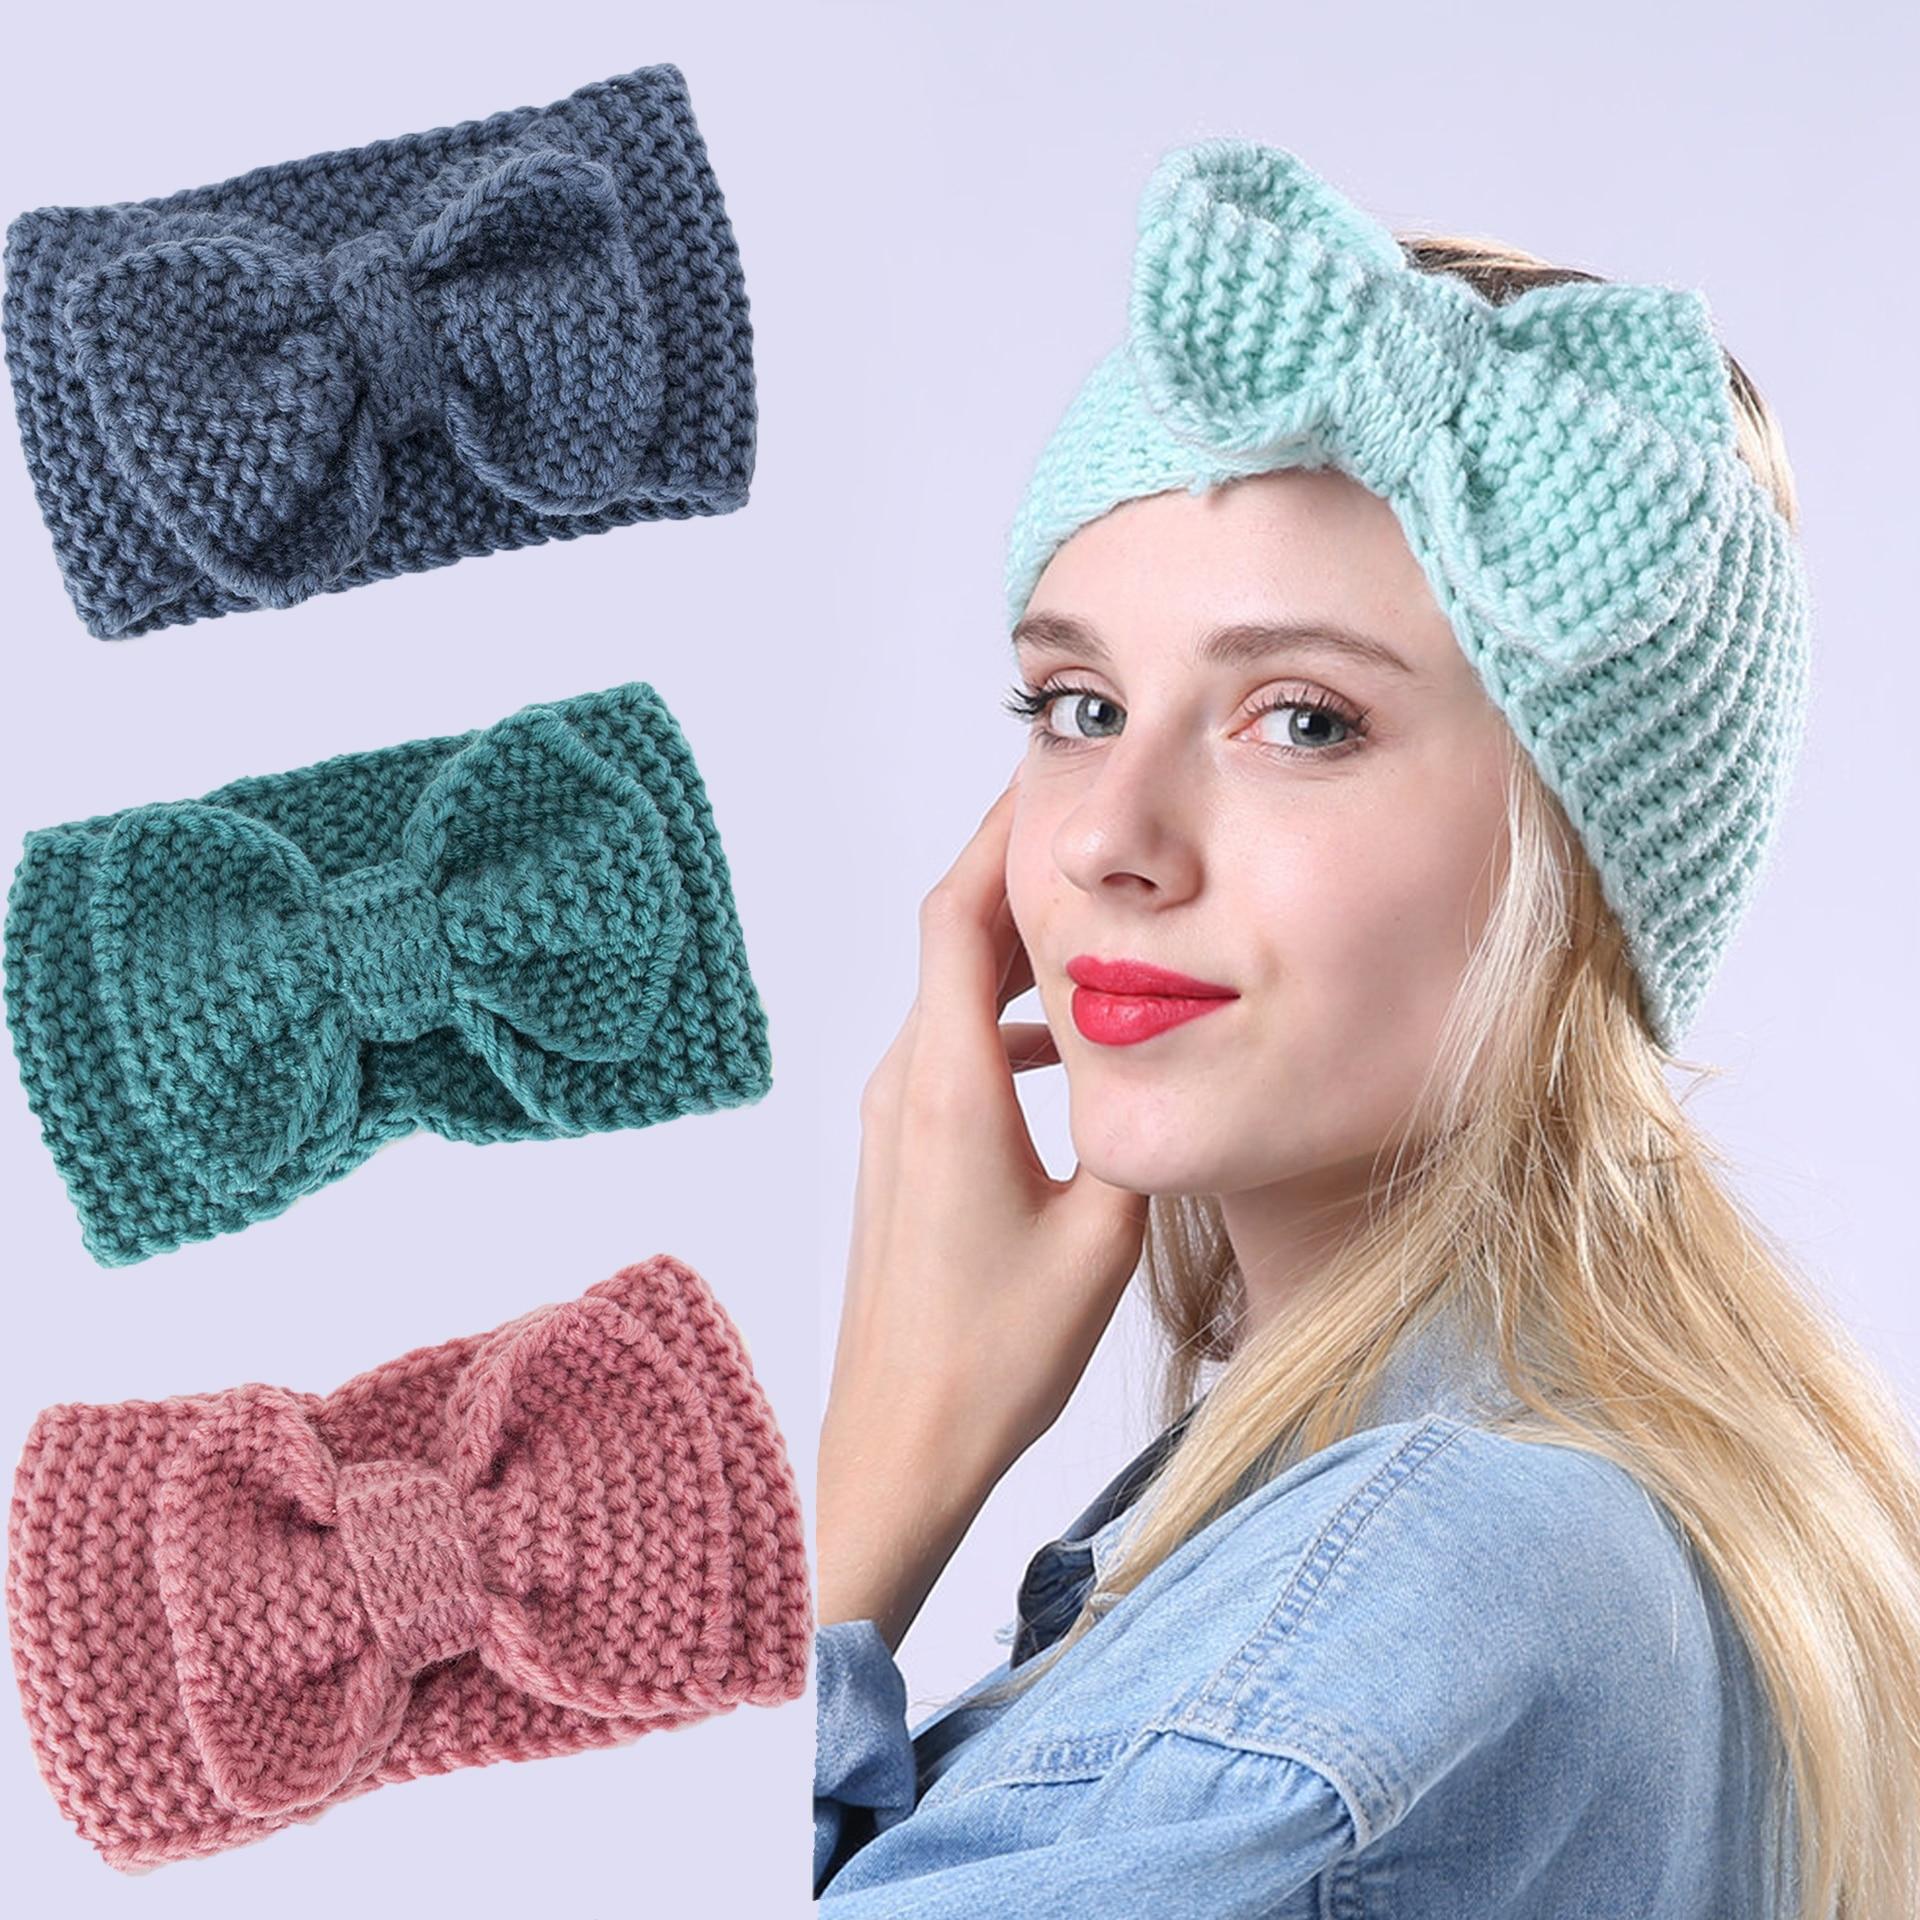 lola headwrap gift for her christmas gift crochet earwarmer Charcoal crochet headband womens headband twist headband